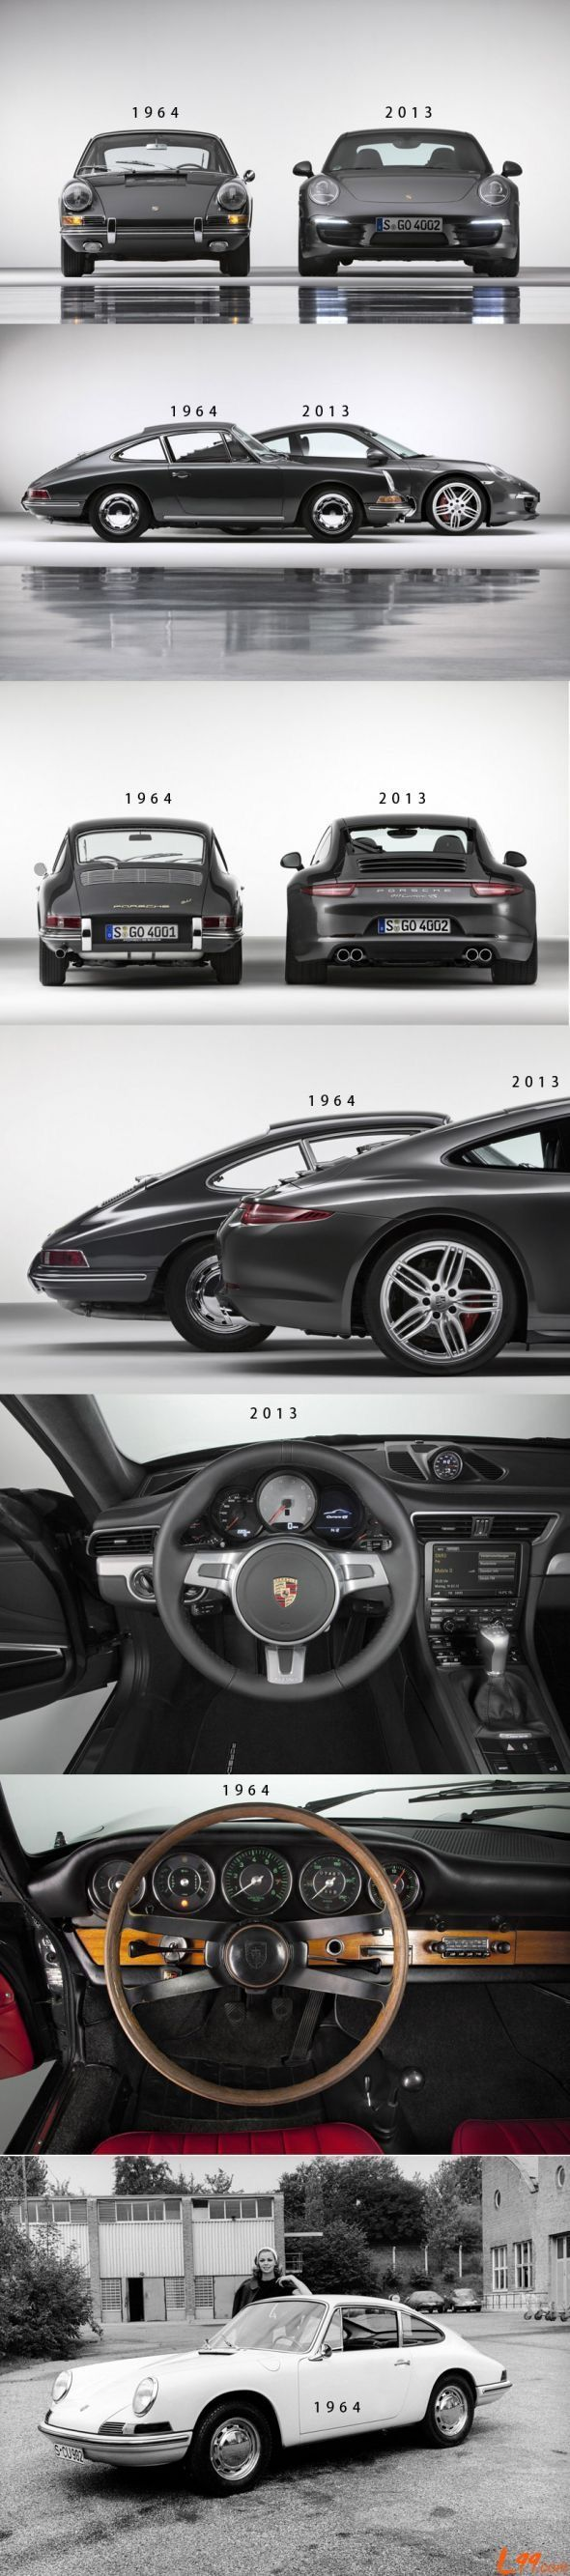 Porsche club porsche 911 car insurance dream cars